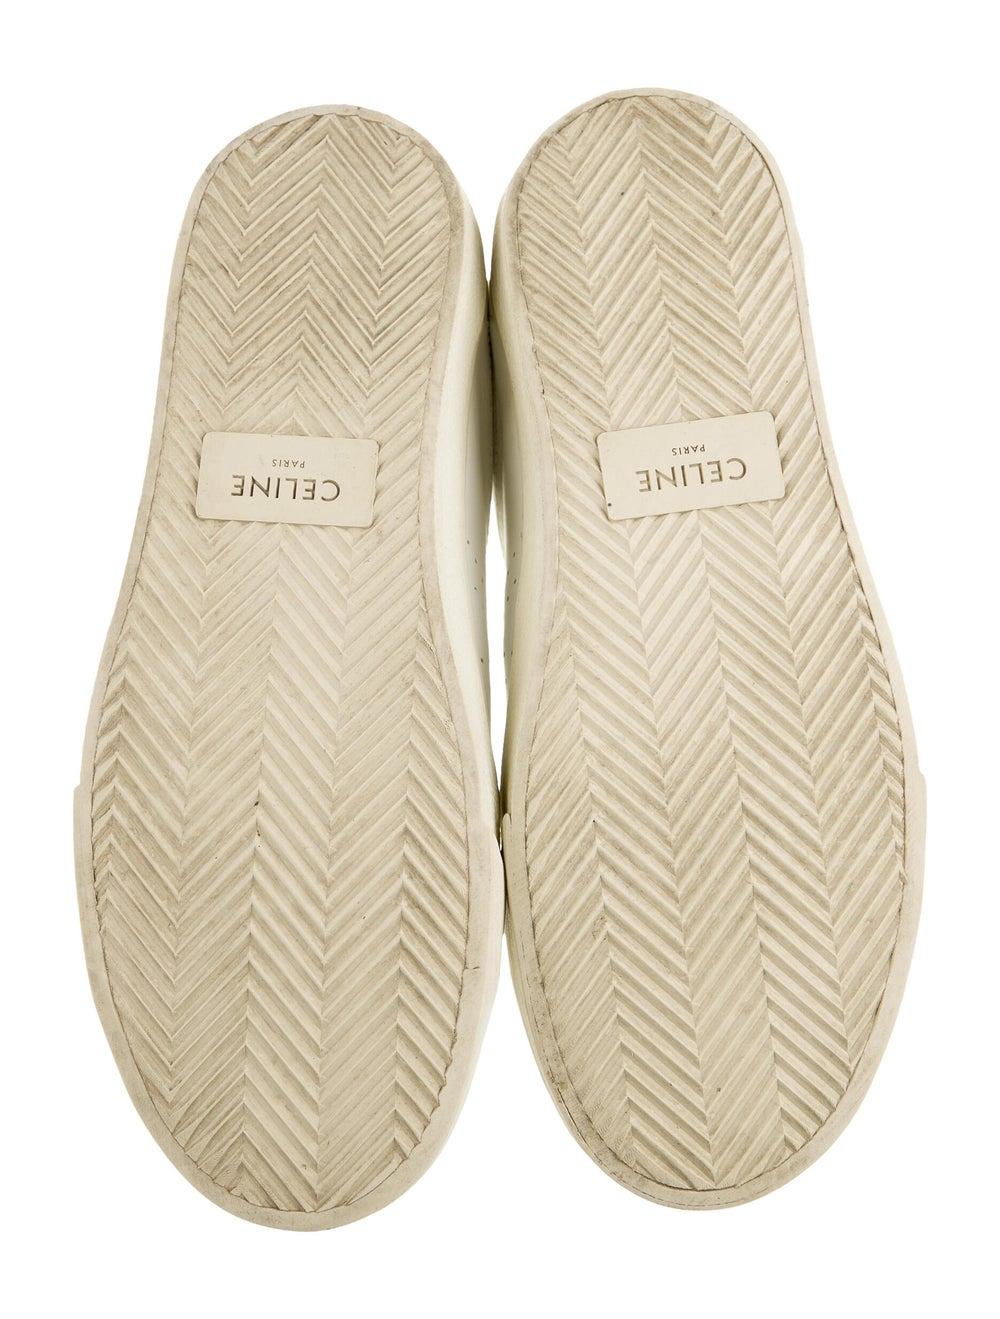 Celine Triomphe Sneakers White - image 5